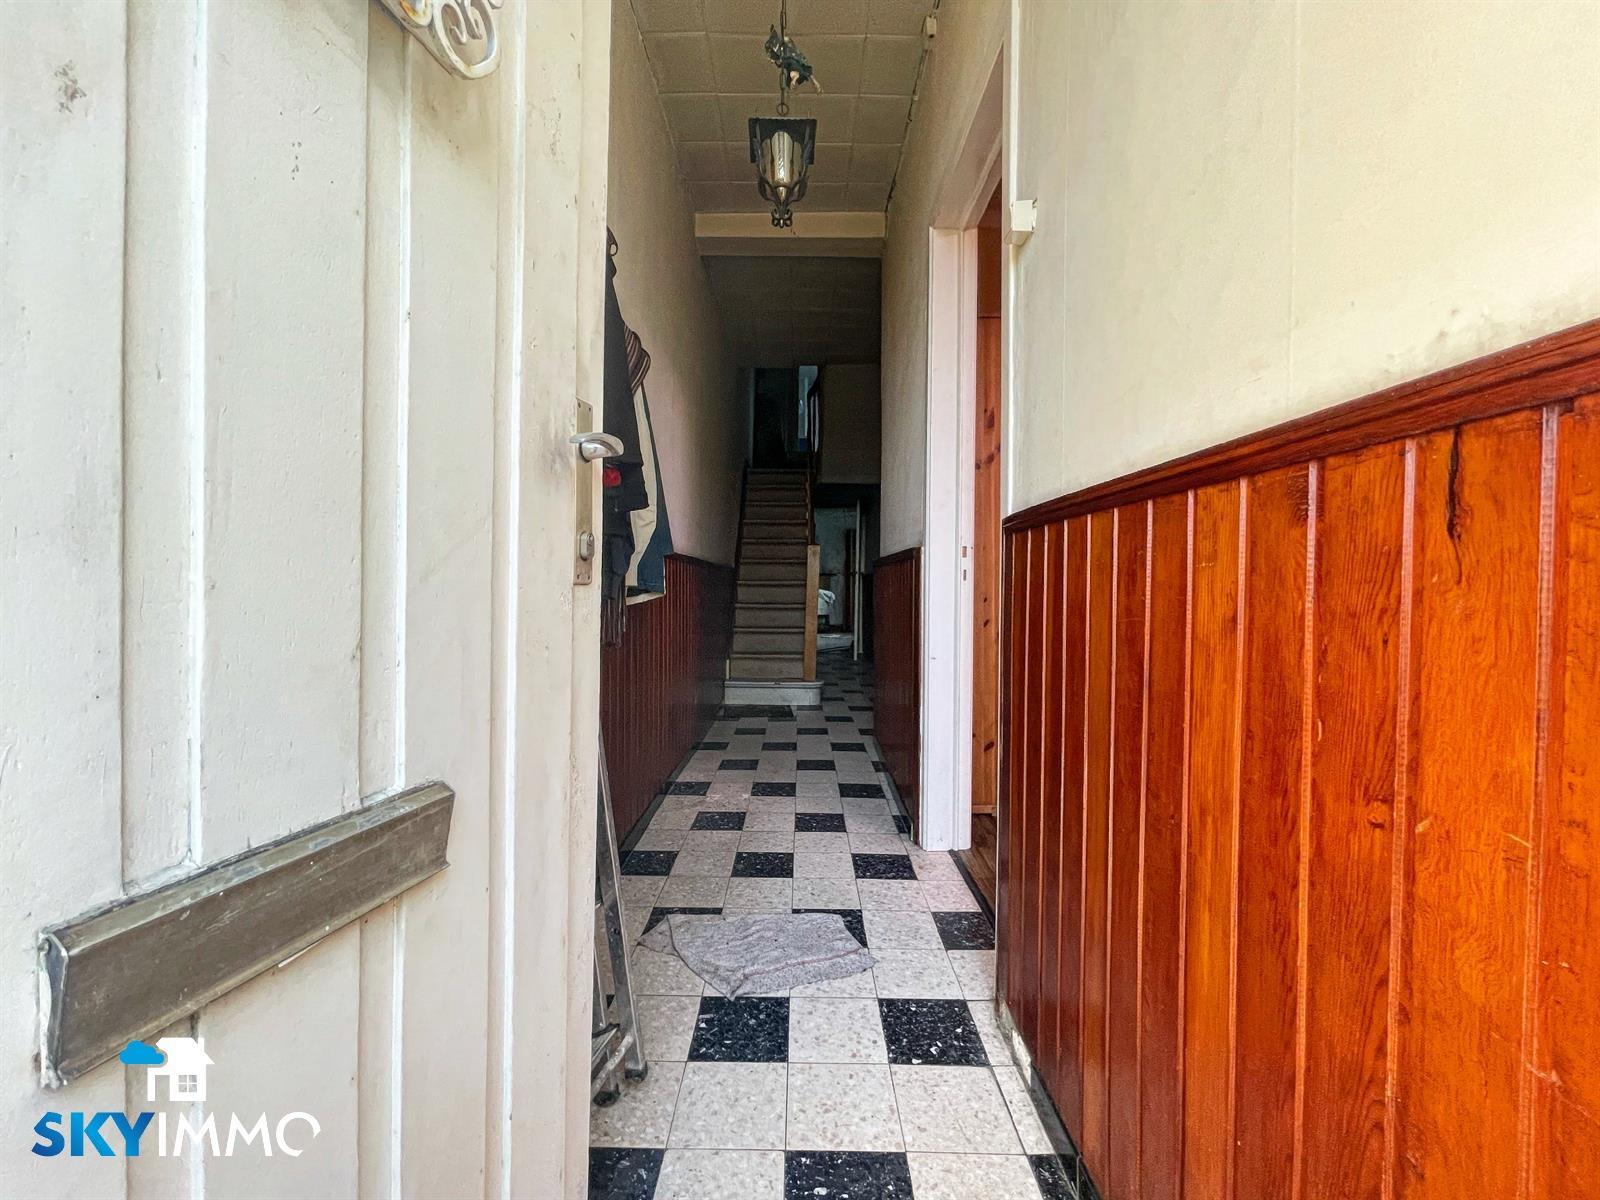 Maison - Seraing Jemeppesur-Meuse - #4383857-3